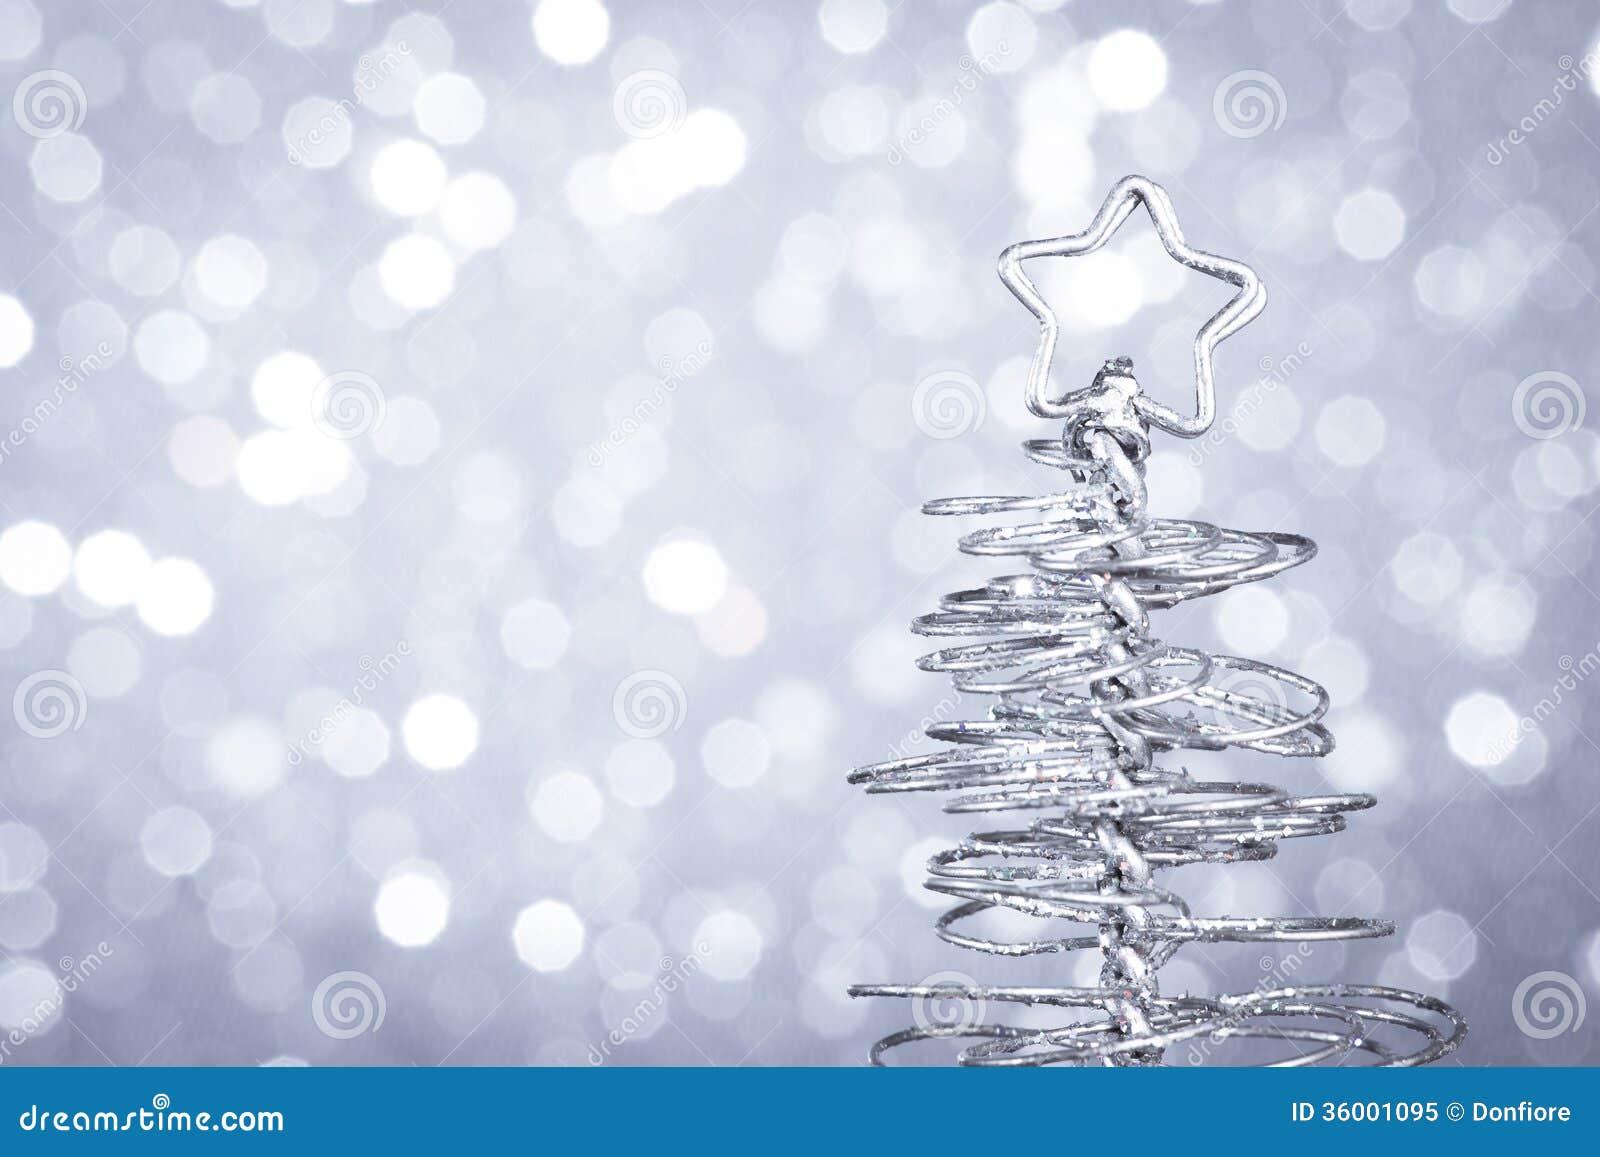 Detail Of Metallic Modern Christmas Tree On Wood Table Royalty ...